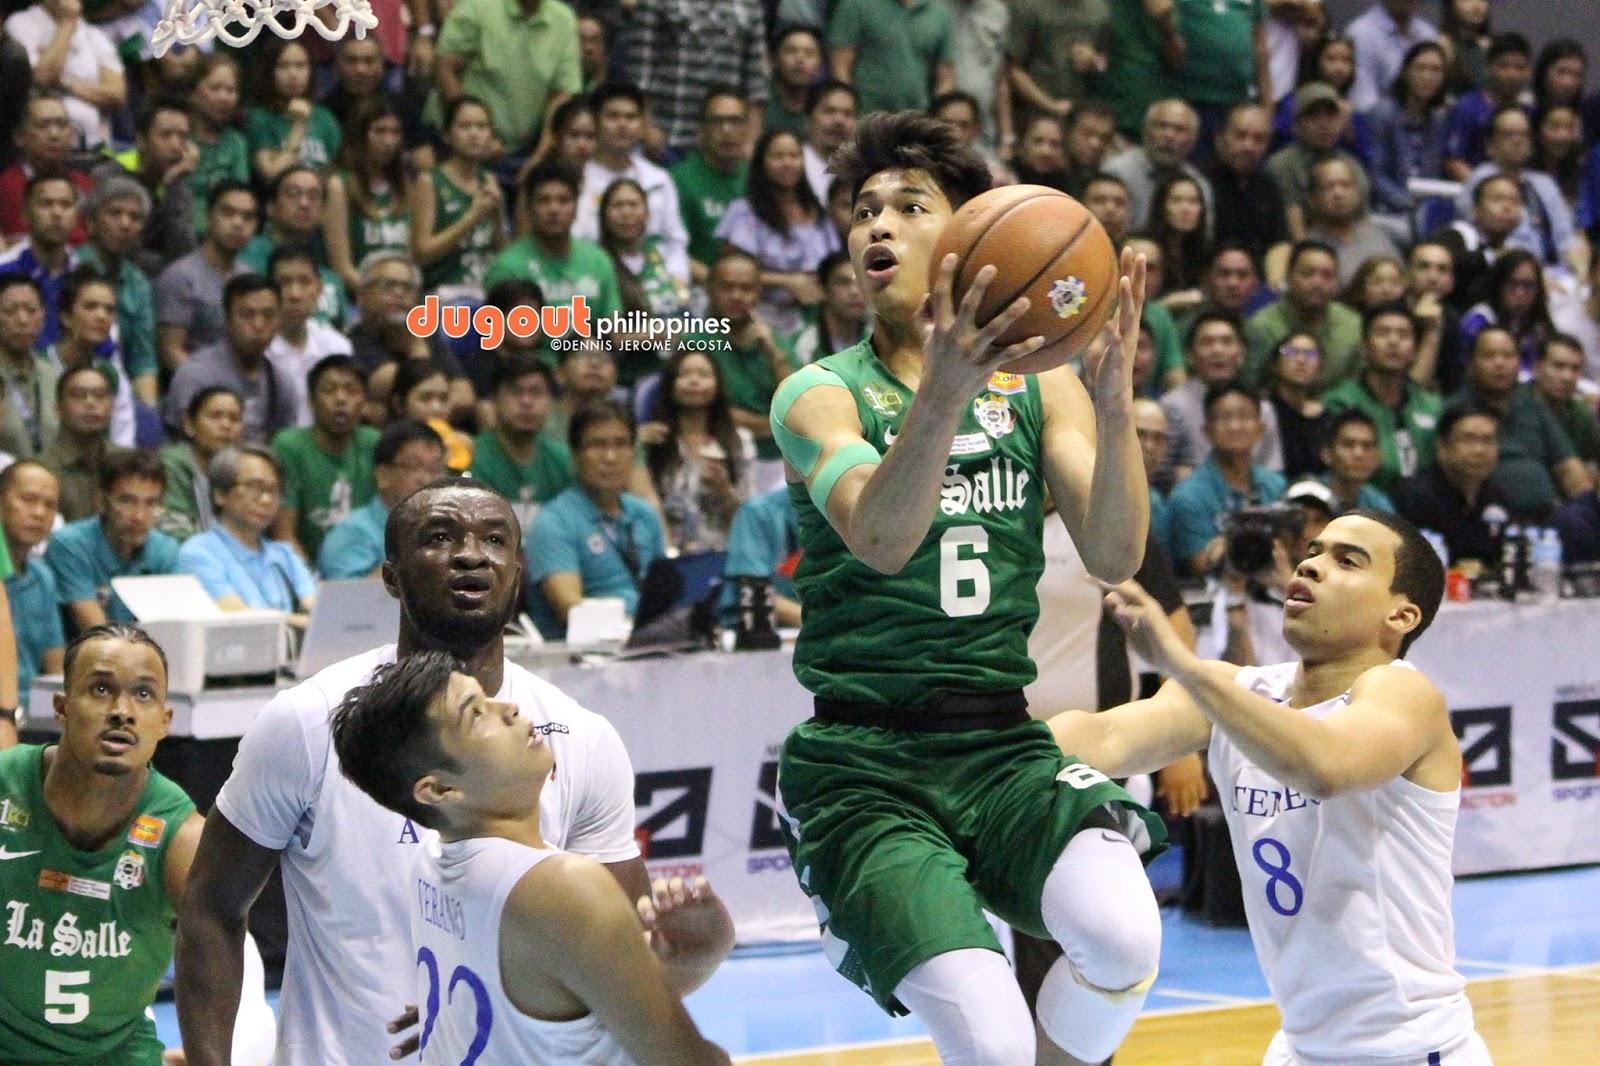 UAAP: Ricci Rivero leaves La Salle